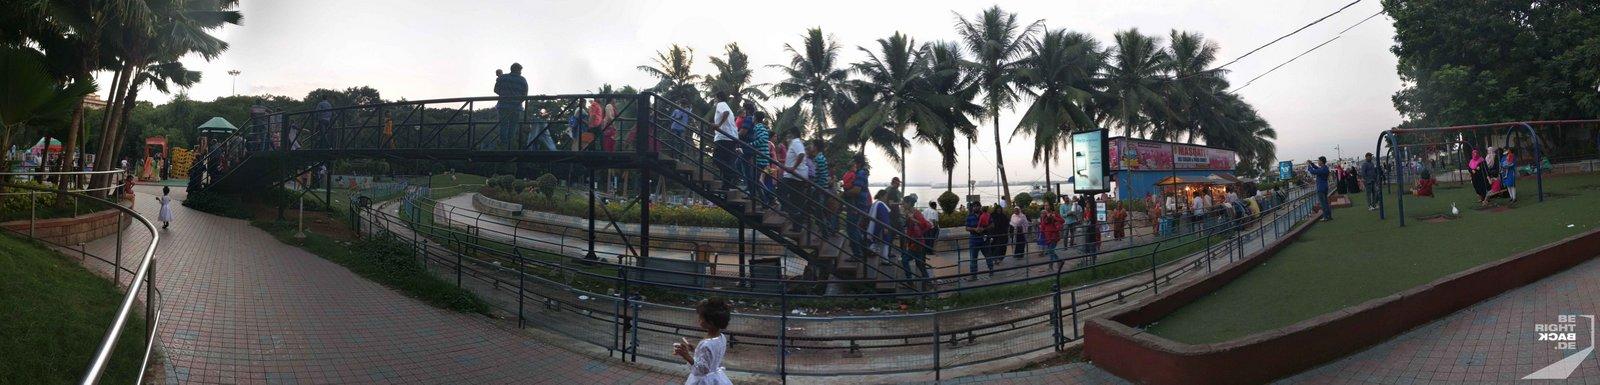 Hyderabad Lumbini Park